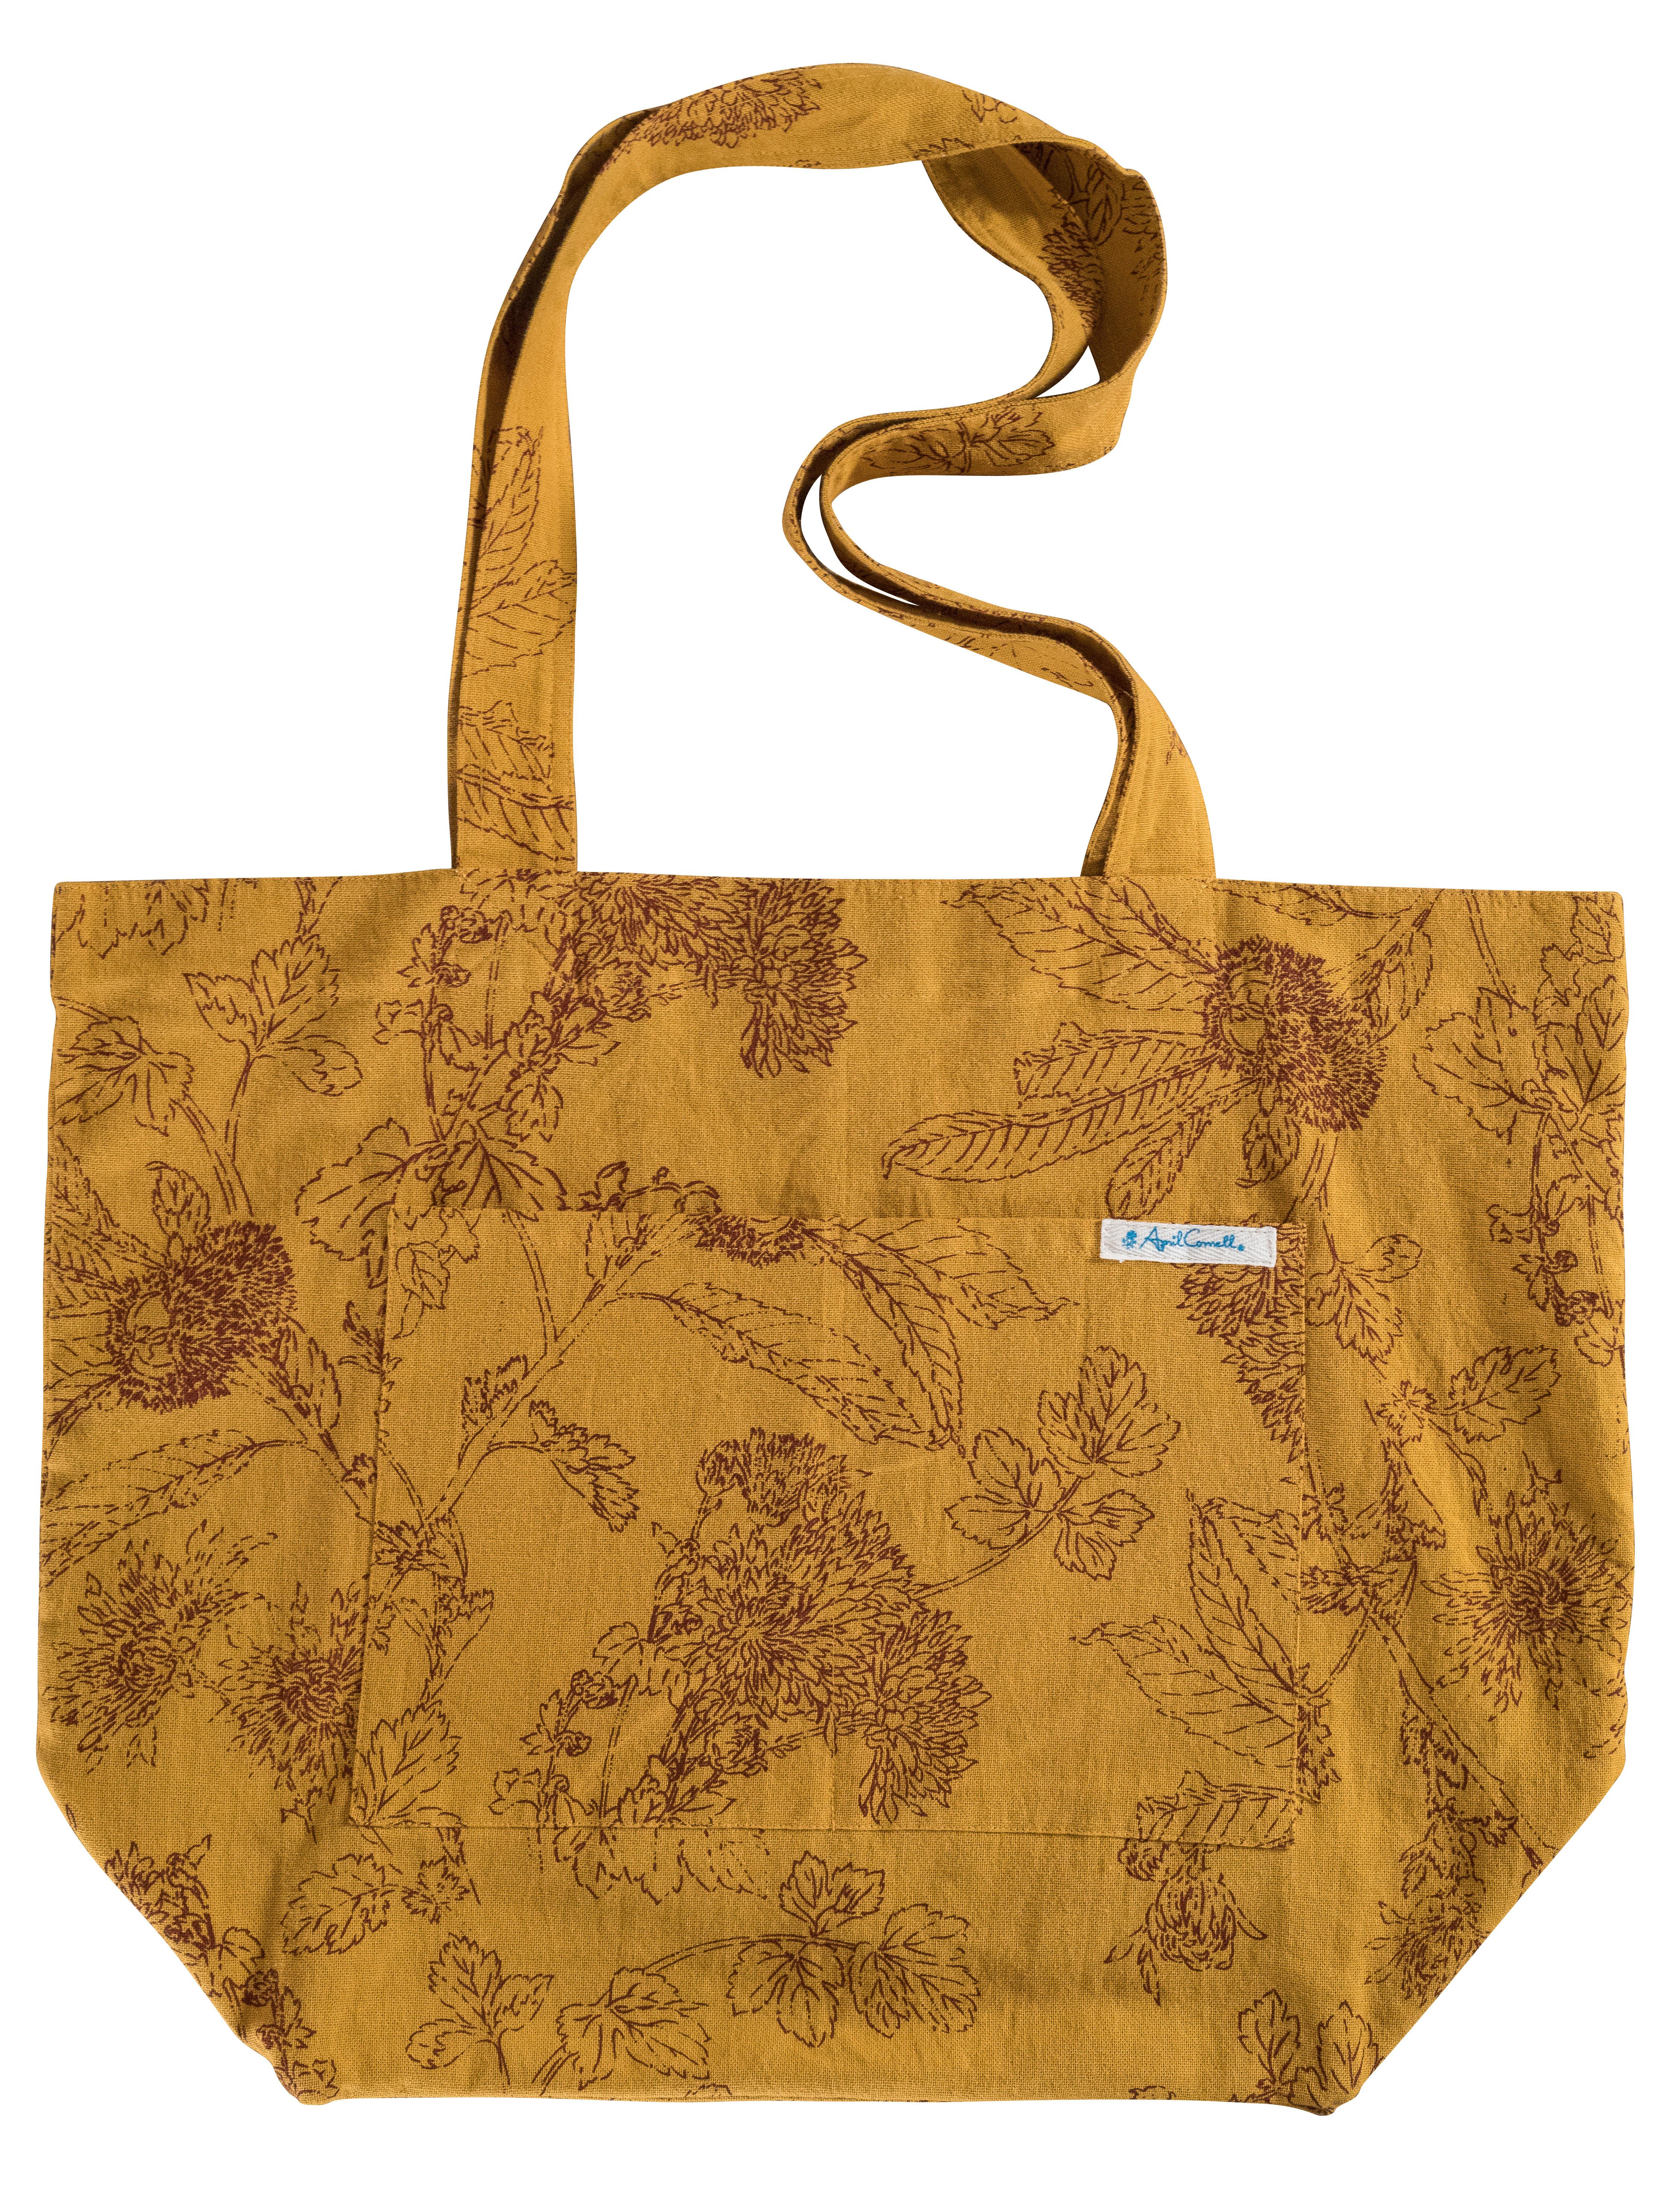 April Cornell Bedding Chestnut Market Bag | Accessories, Bags :Beautiful Designs ...